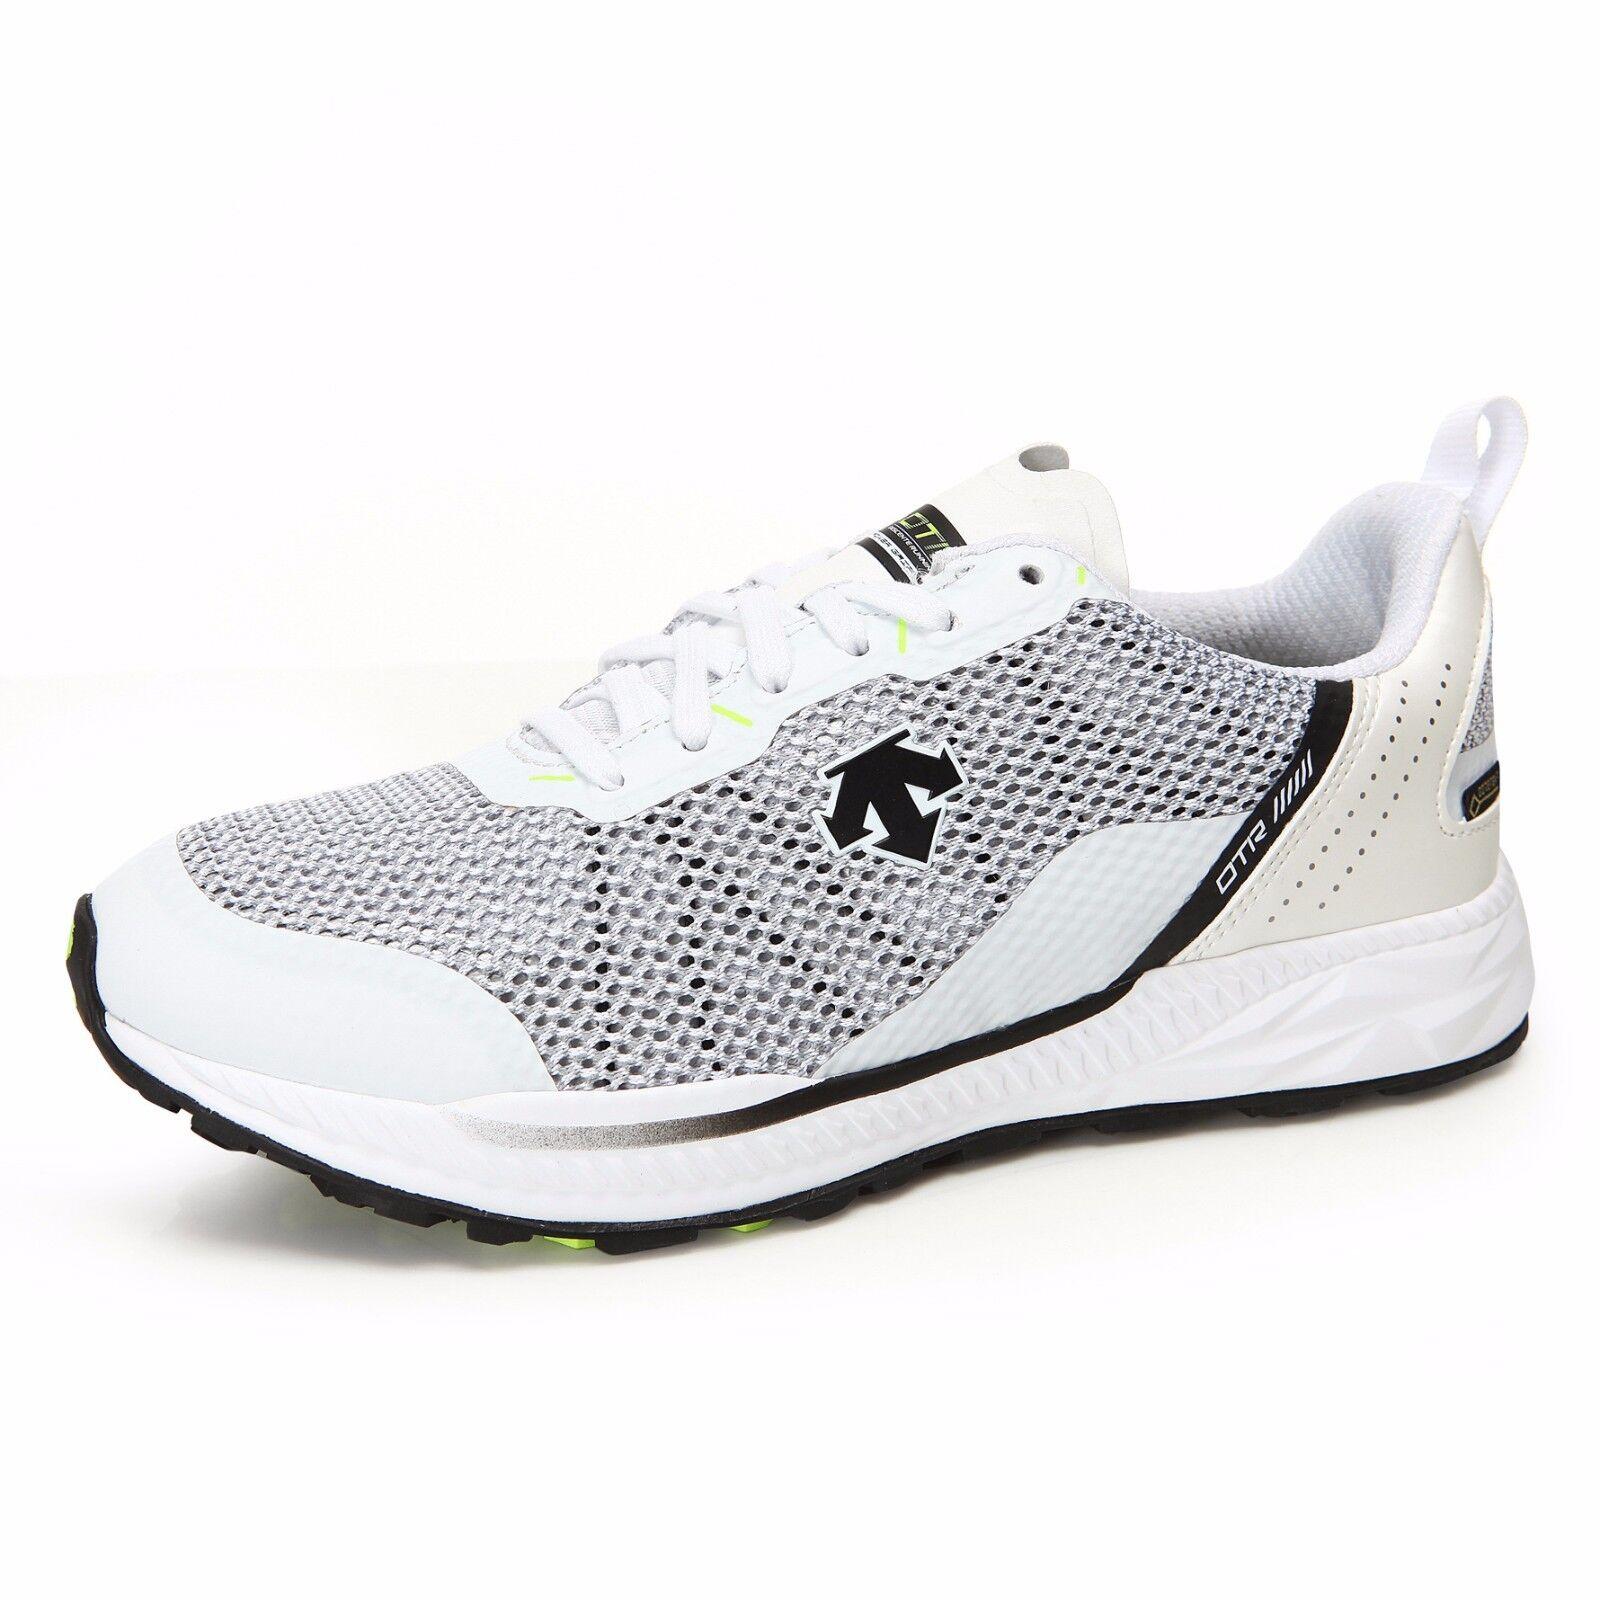 Descente Men's Blaze Tough Wide White GoreTex Running shoes Authentic NEW